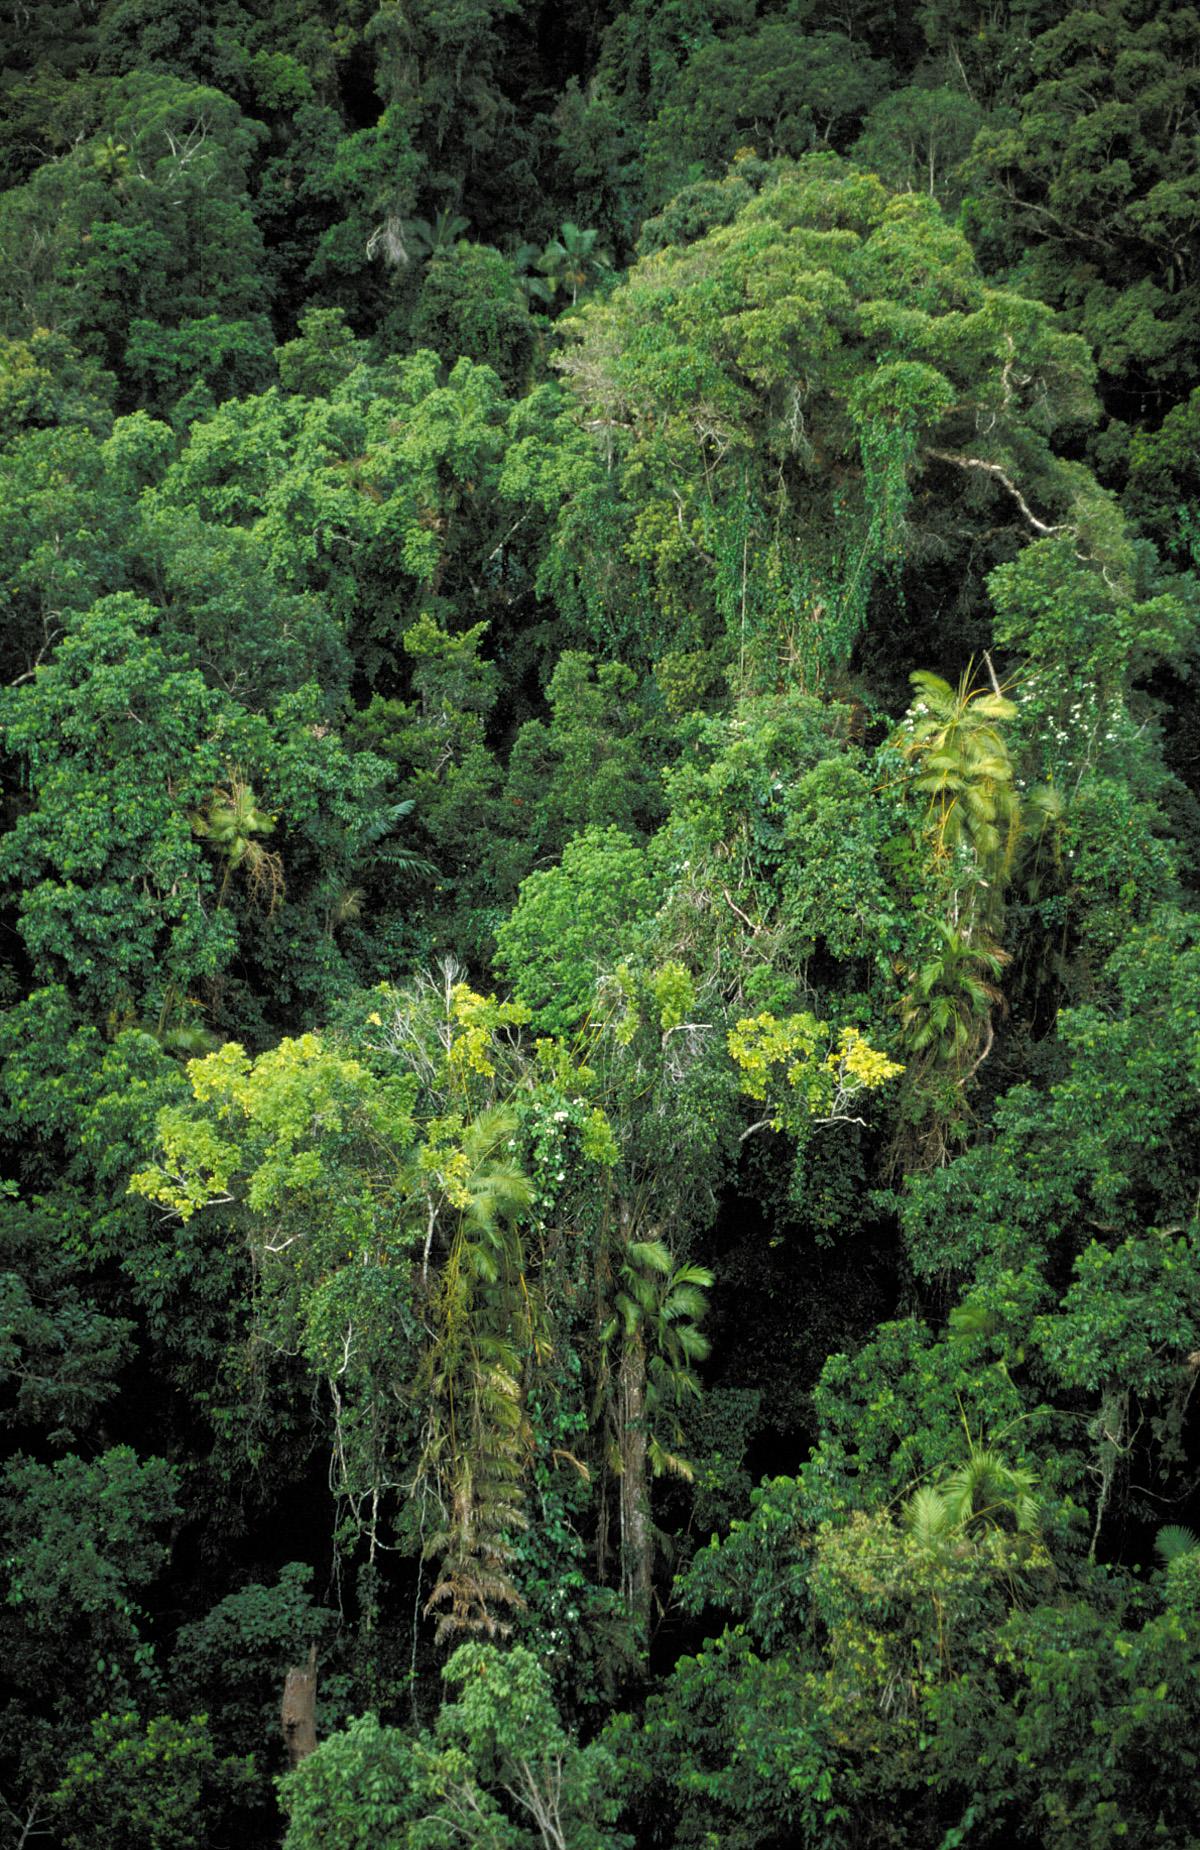 FileCSIRO ScienceImage 3830 Tropical rainforest canopy near Cairns QLD.jpg & File:CSIRO ScienceImage 3830 Tropical rainforest canopy near ...